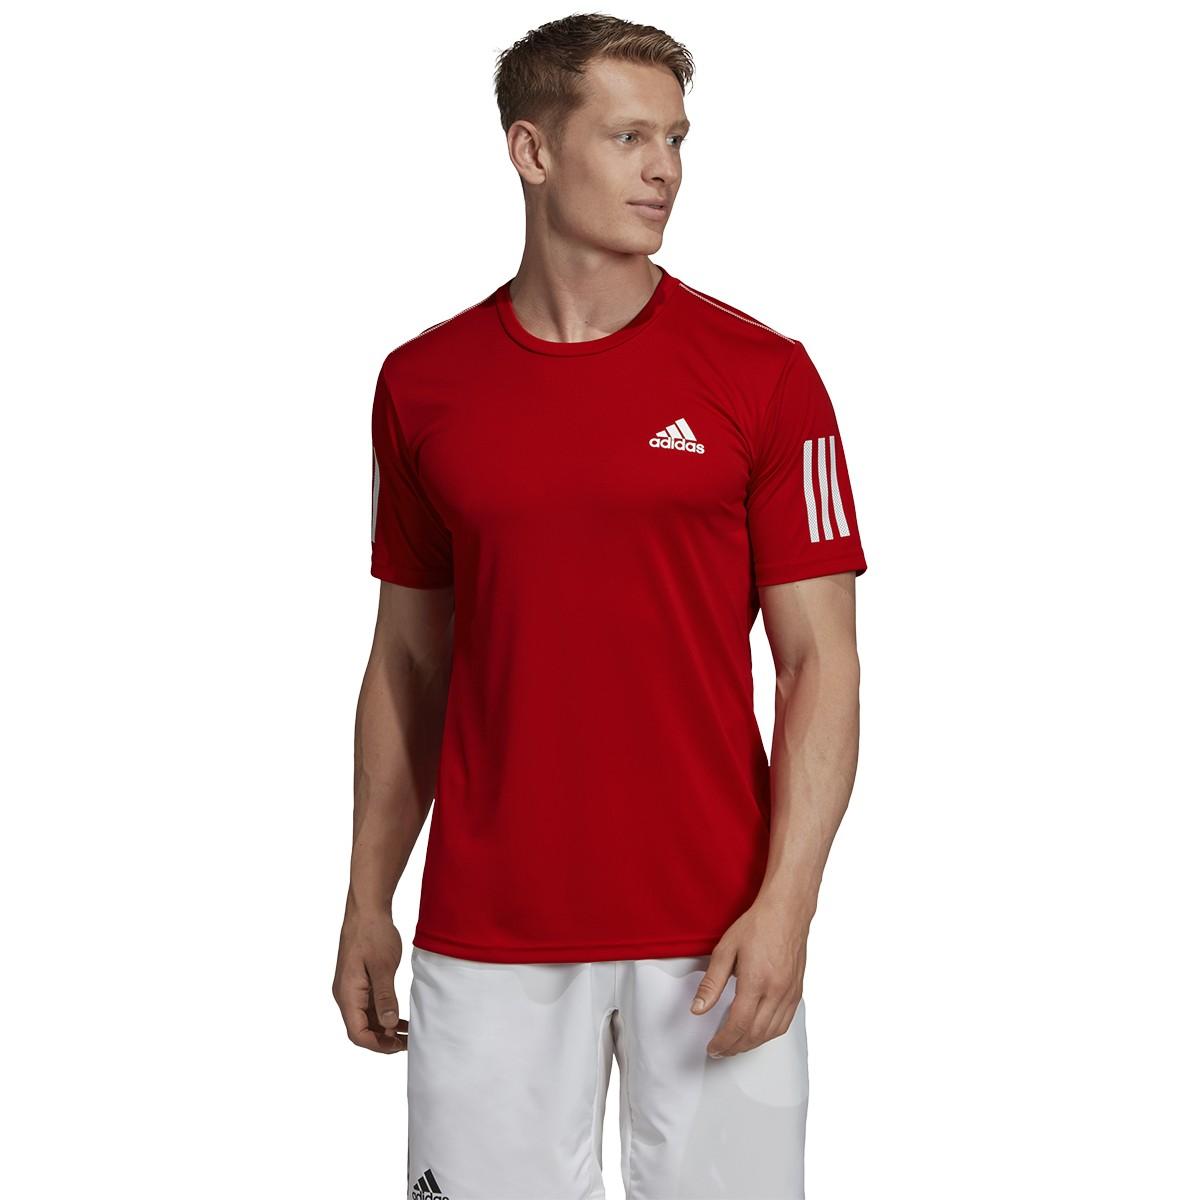 adidas 3 stripes shirt bordeaux